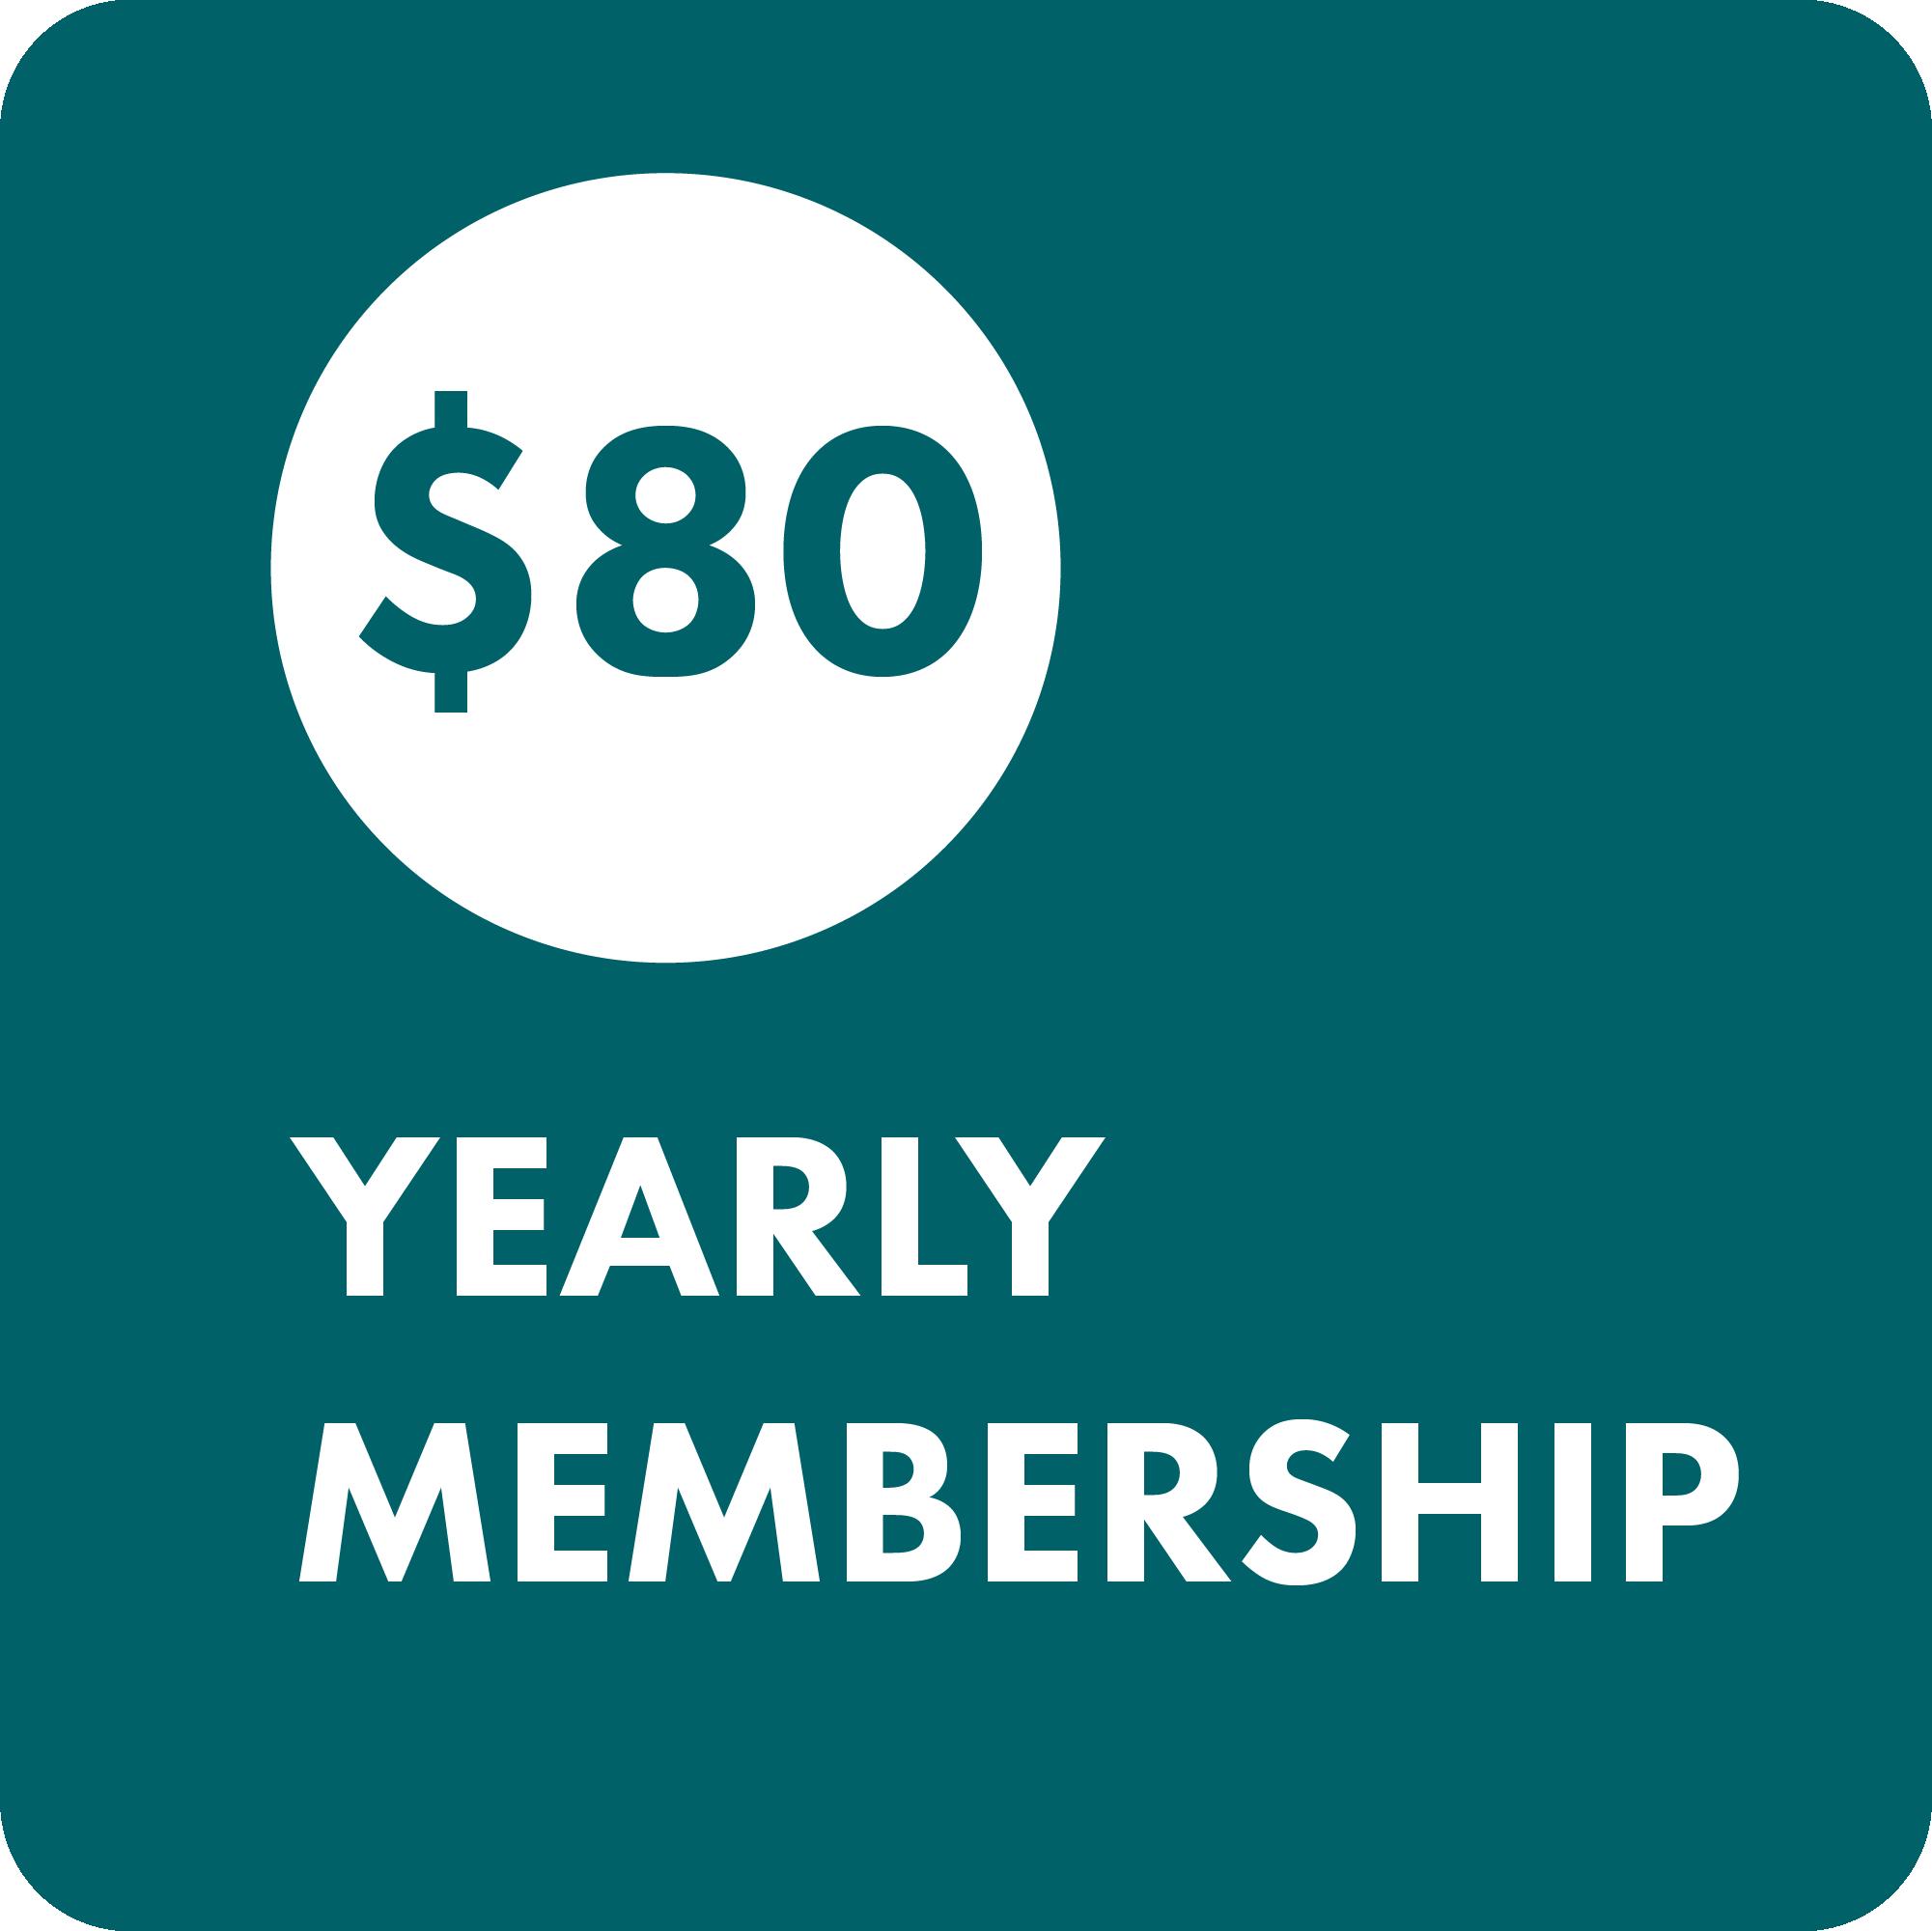 Yearly Membership.png